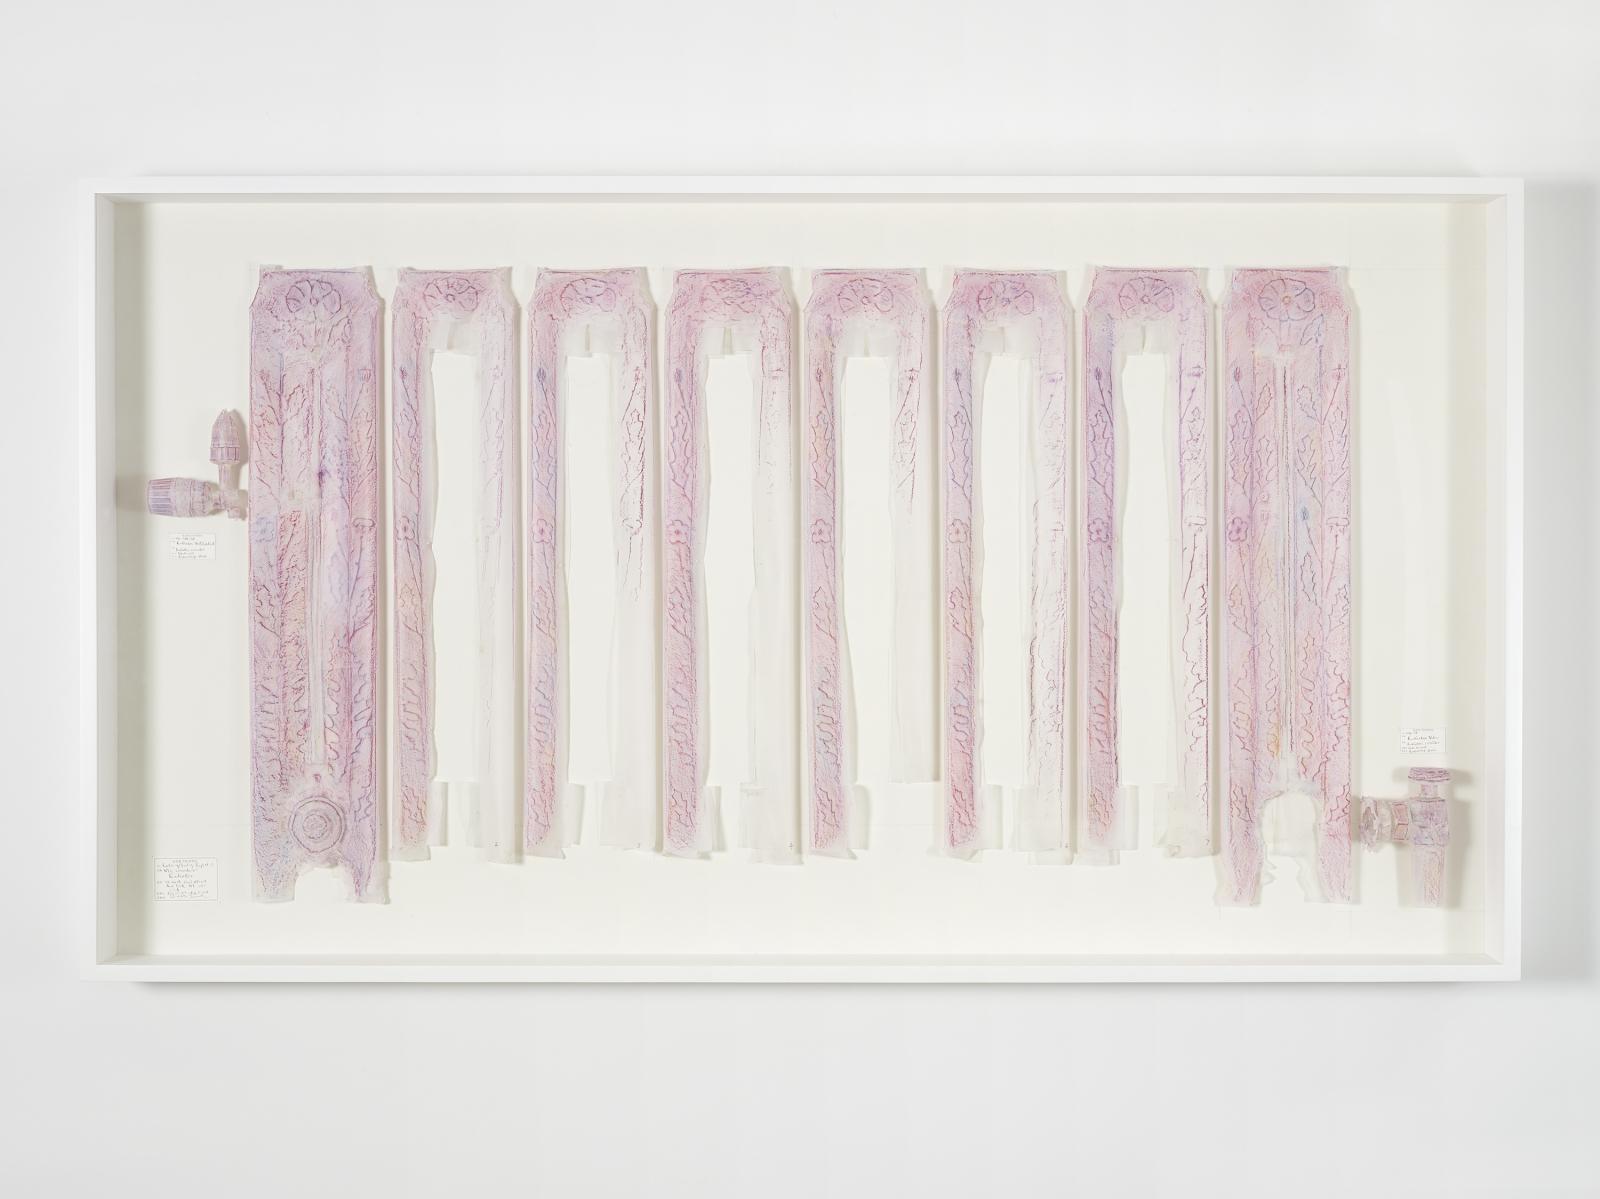 DO HO SUH, Rubbing/Loving Project: Radiator, Corridor, 348 West 22nd Street, New York, NY 10011, USA, 2014